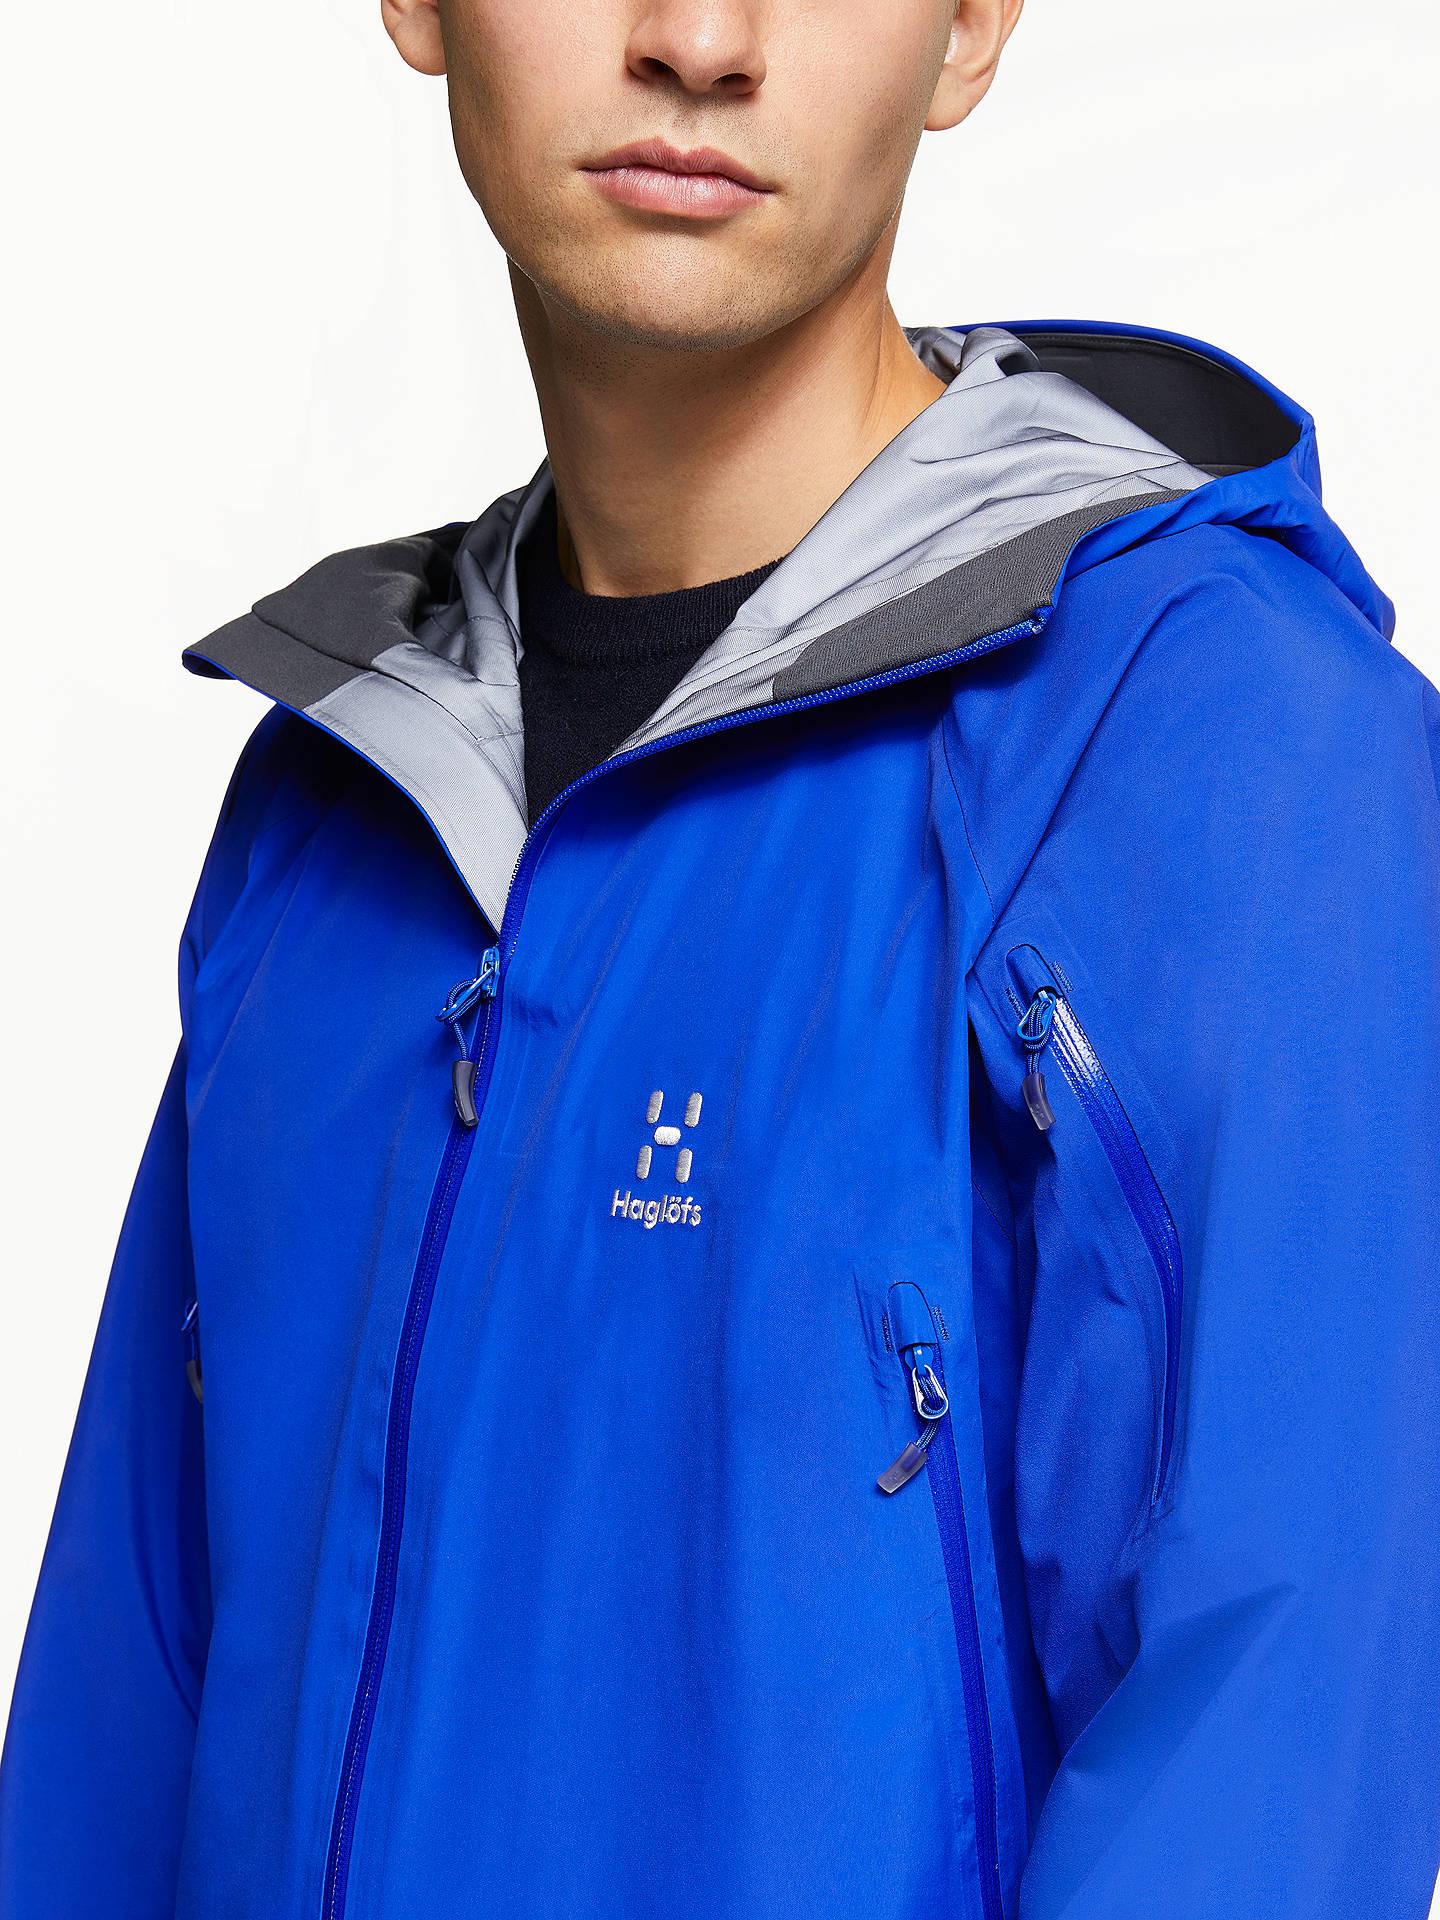 d1cdfaabc Haglöfs Roc Spirit Men's Waterproof Jacket, Blue at John Lewis ...